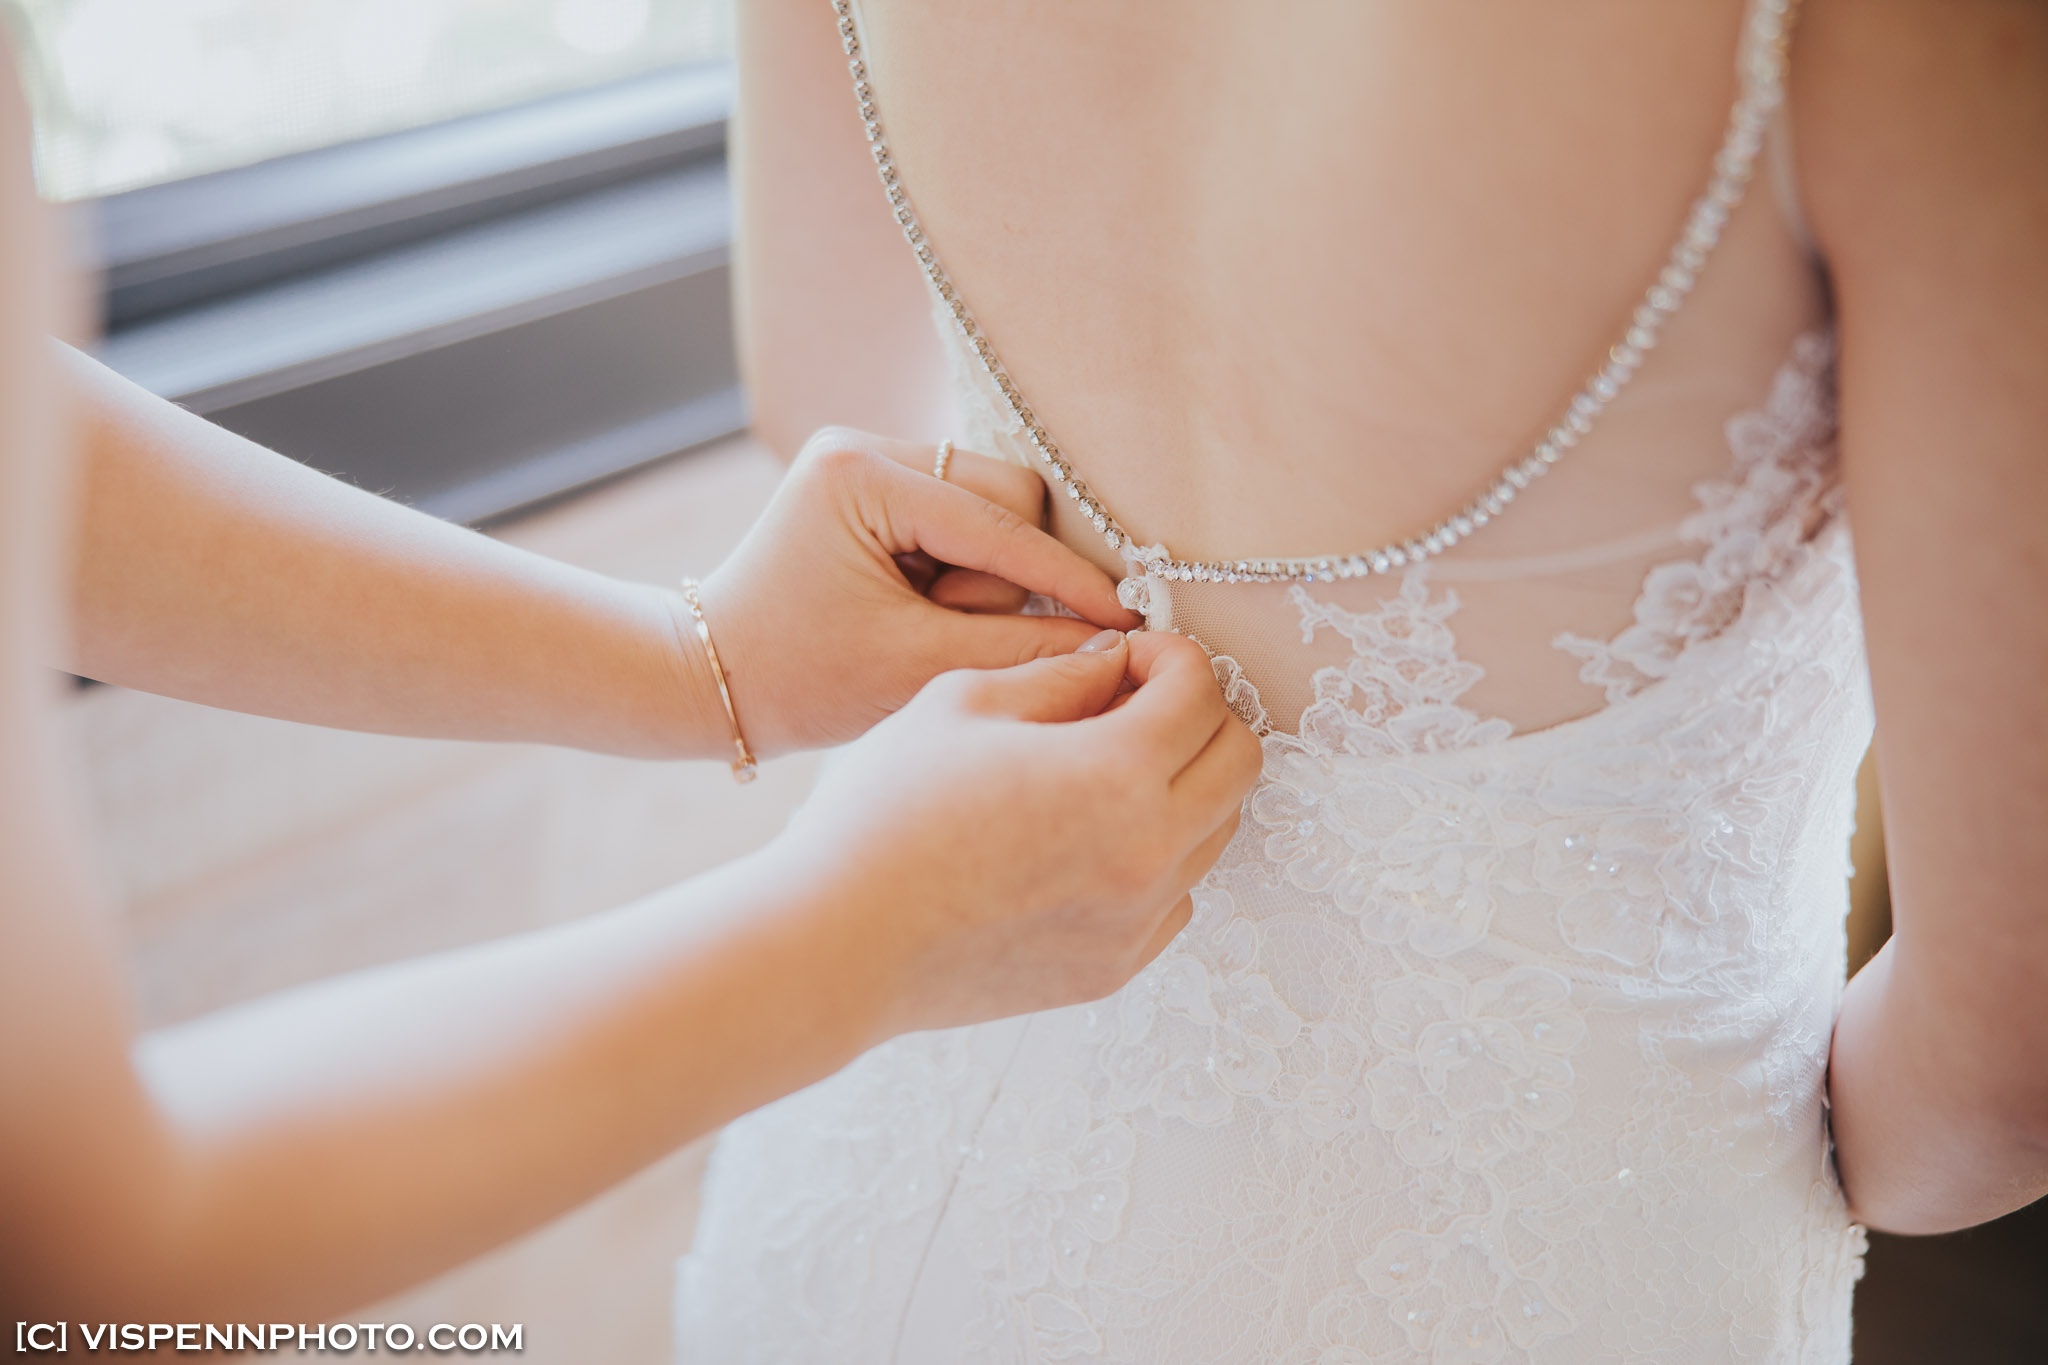 WEDDING DAY Photography Melbourne ElitaPB 04891 1P EOSR ZHPENN